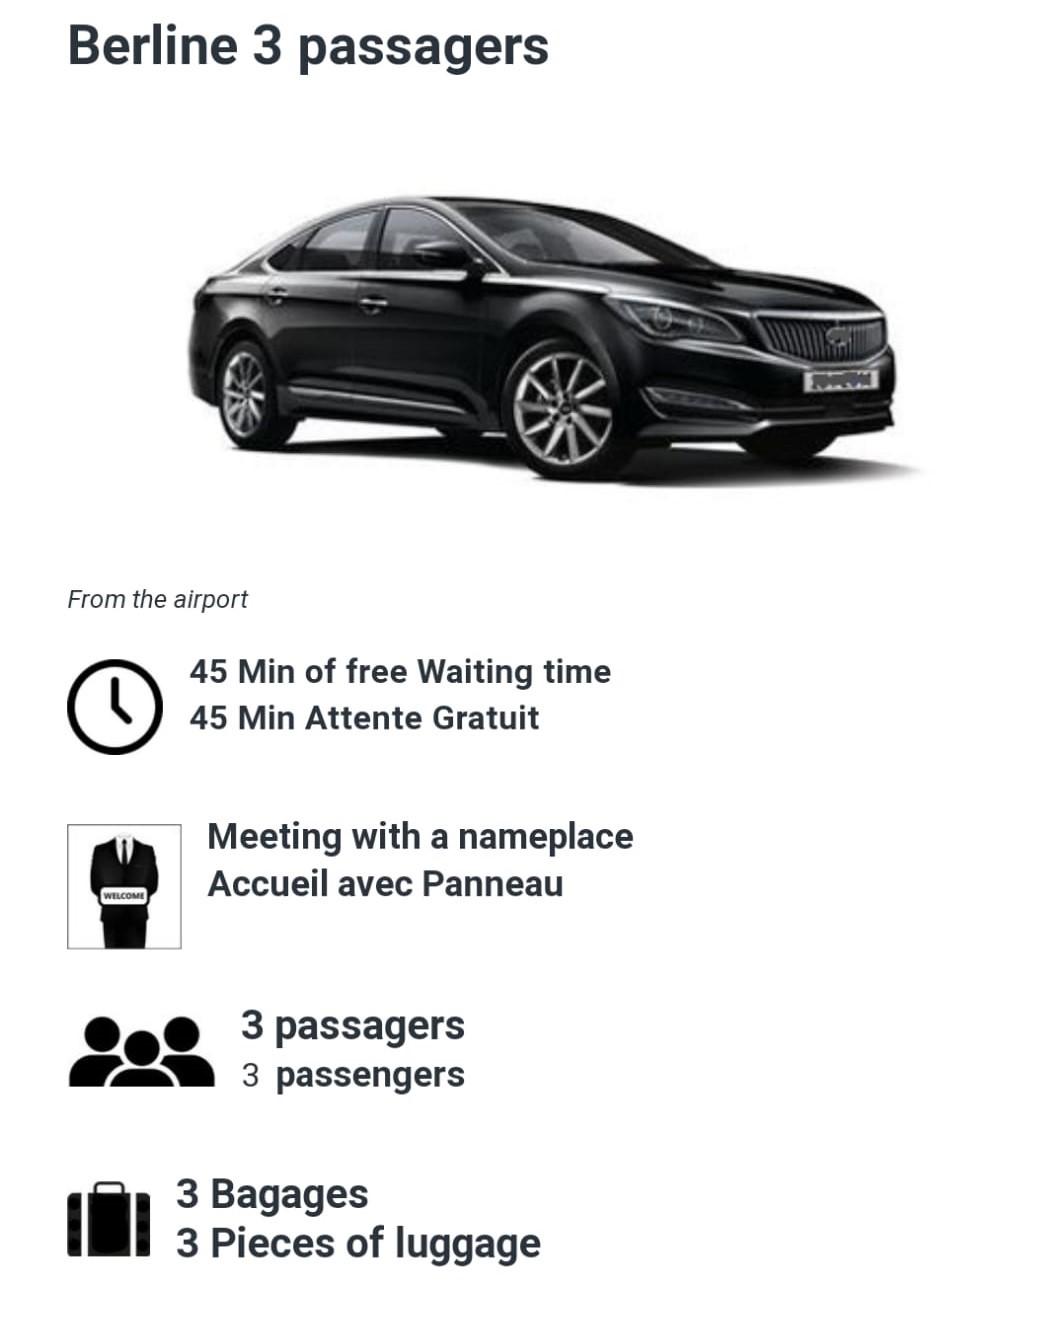 3 Passenger car